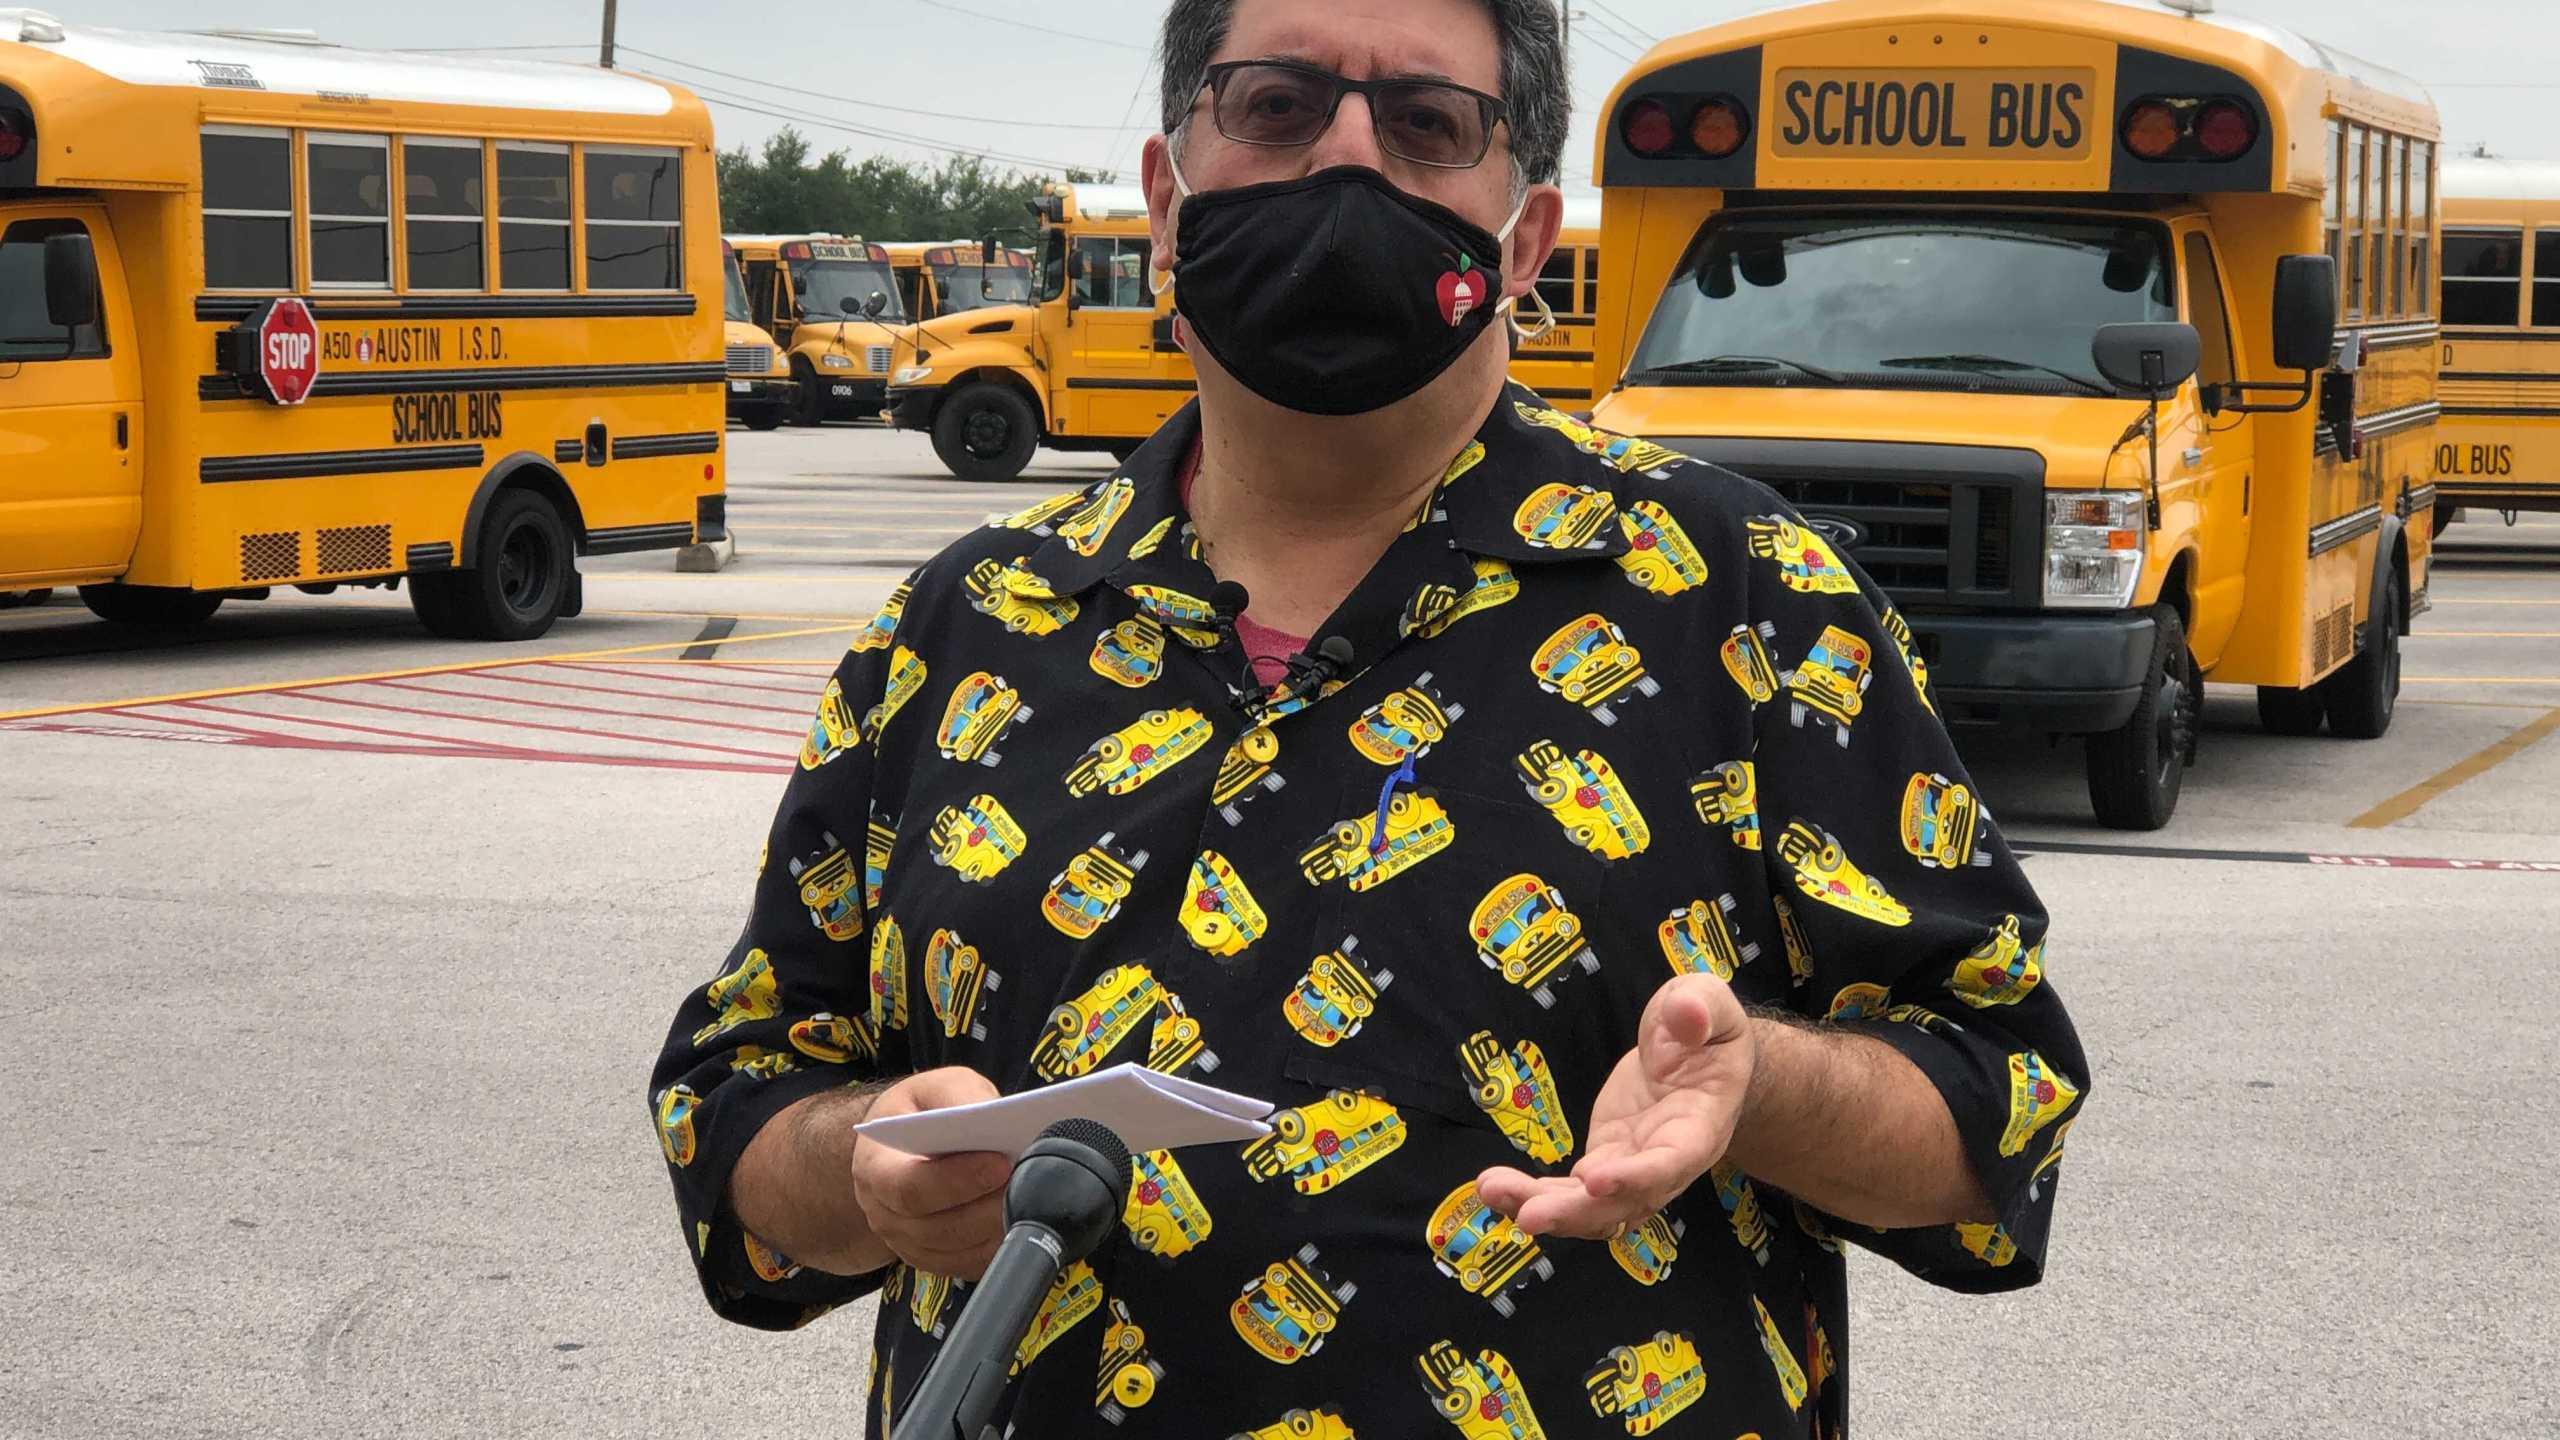 Kris Hafezizadeh, AISD's executive director of transportation, at the district's bus terminal, (KXAN photo/Frank Martinez)